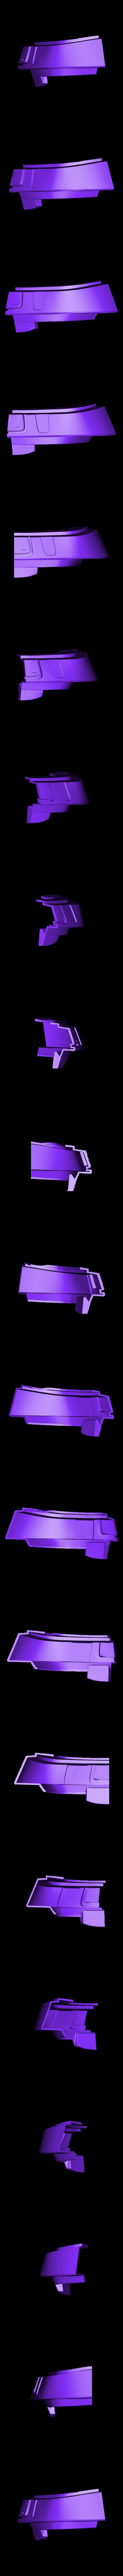 Part_11_v2.stl Download free STL file Battlestar Galactica Colonial Viper Pilot Helmet • 3D printing object, VillainousPropShop